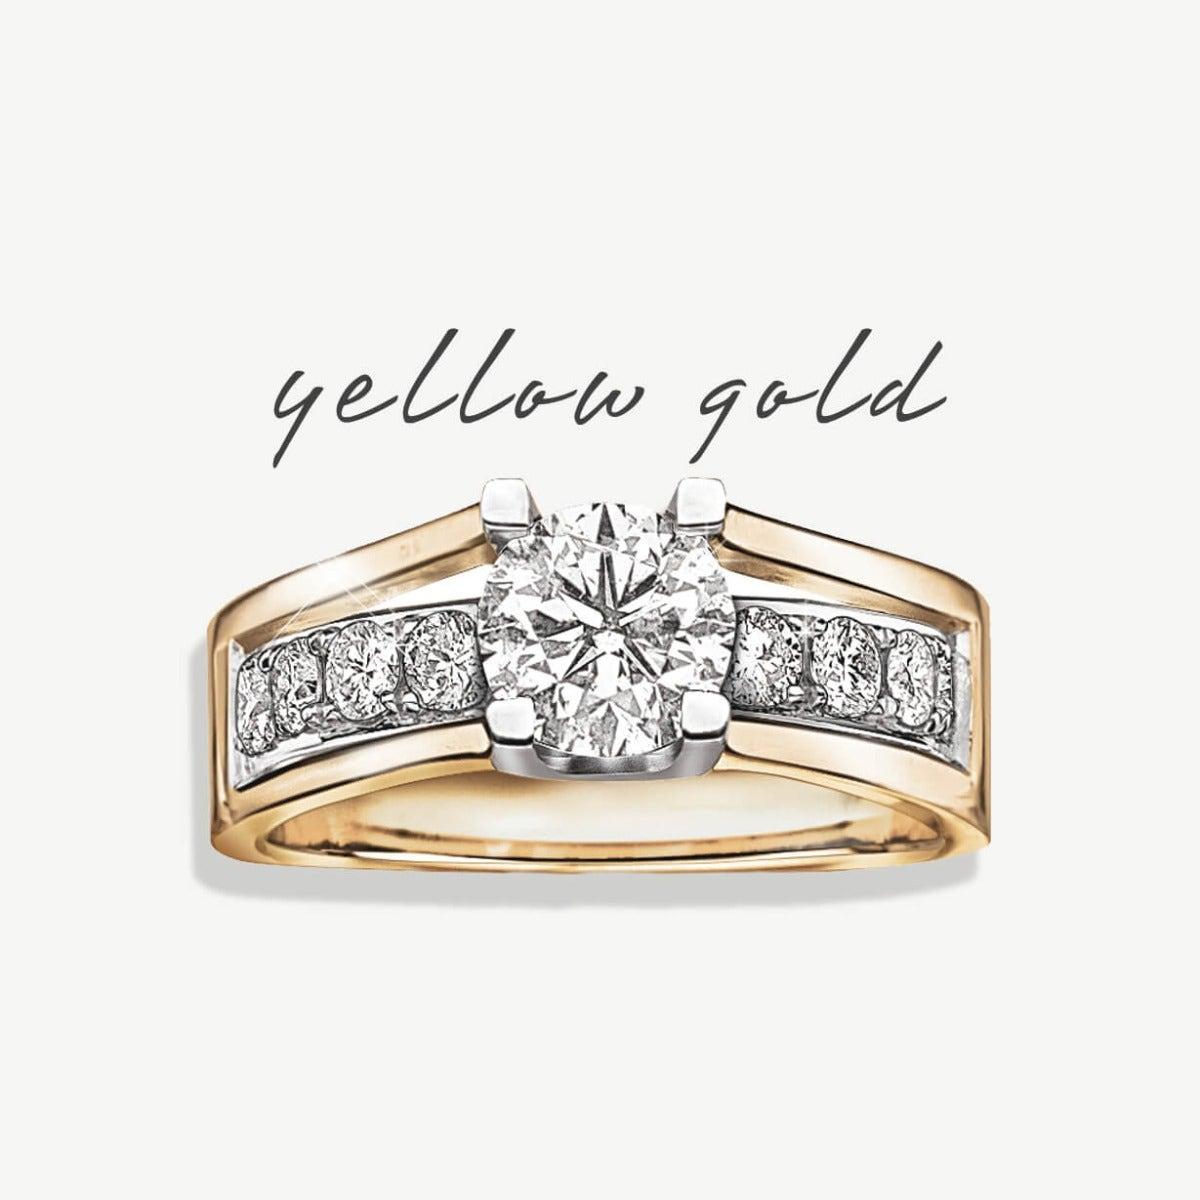 Yellow Gold Metal Designs